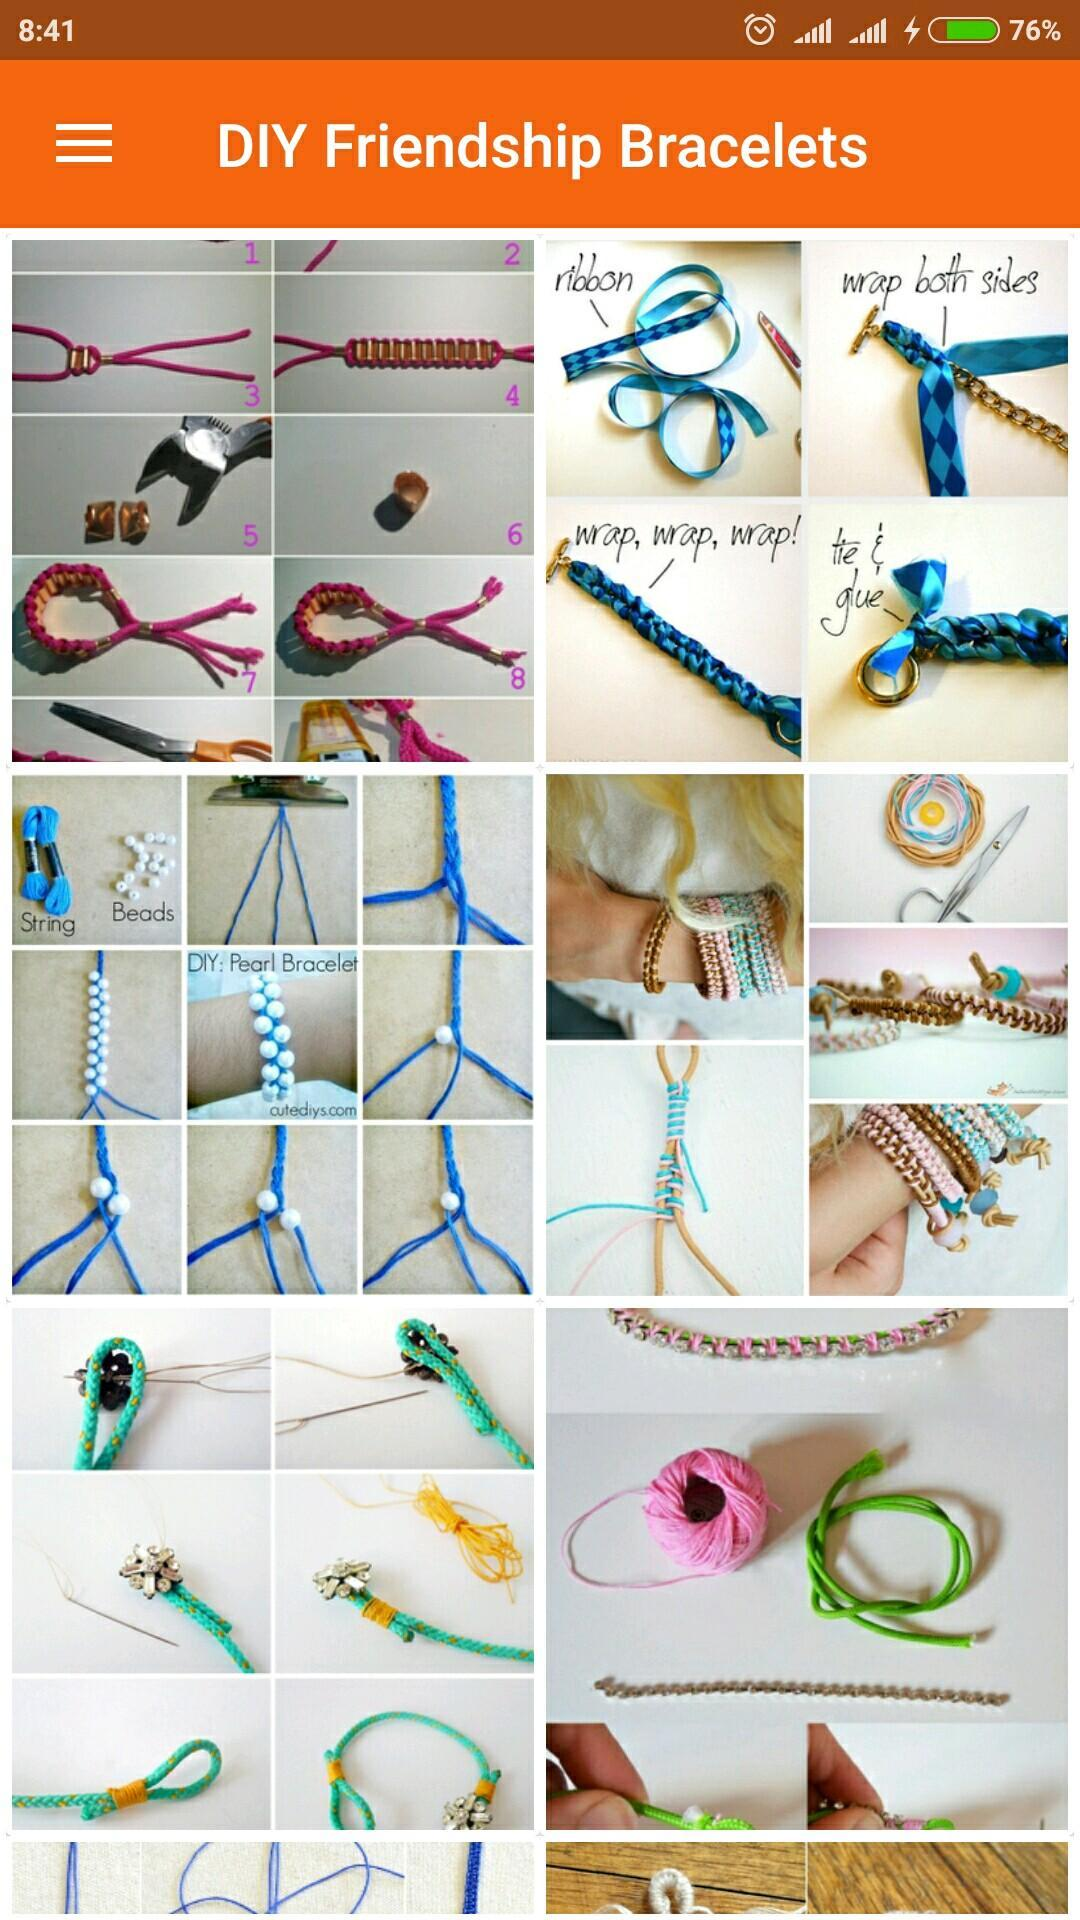 Diy Friendship Bracelets For Android